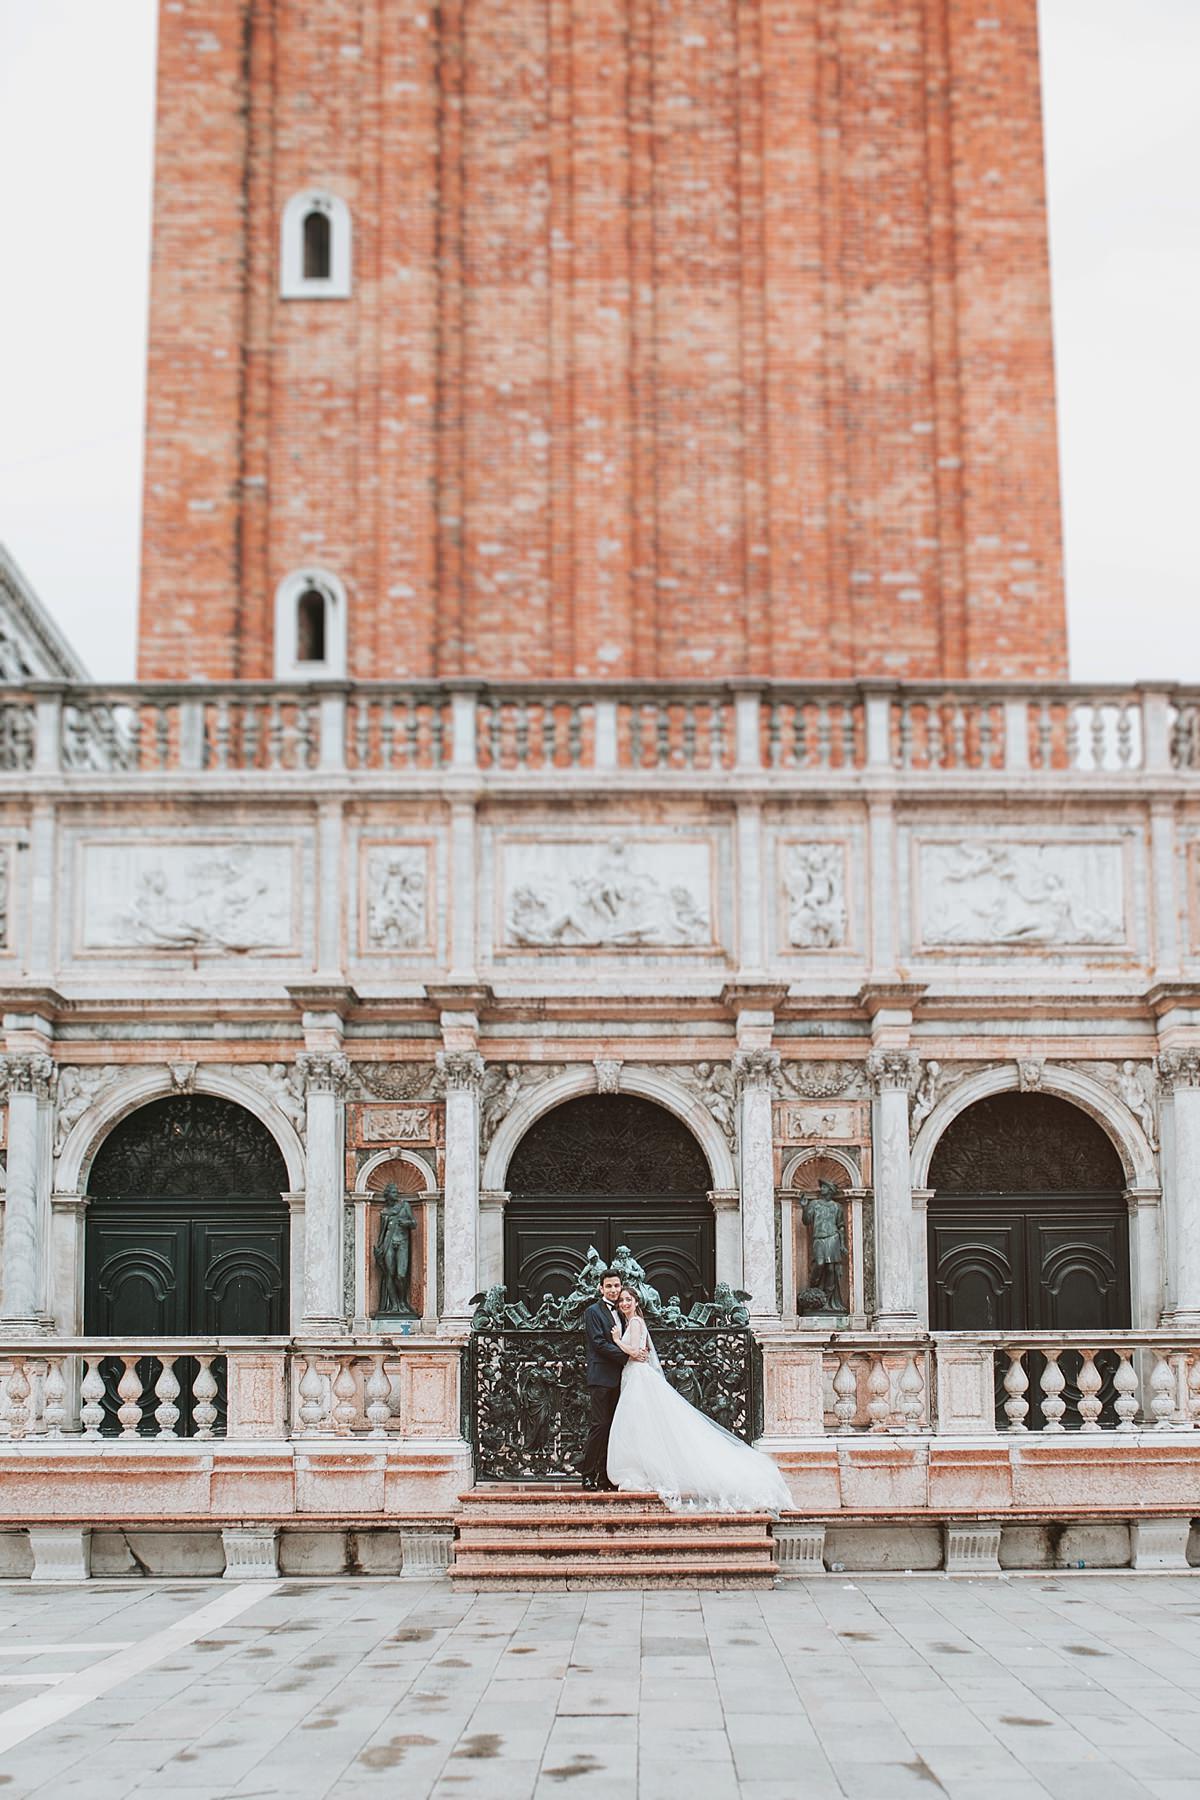 romantica-luna-di-miele-a-venezia_0012